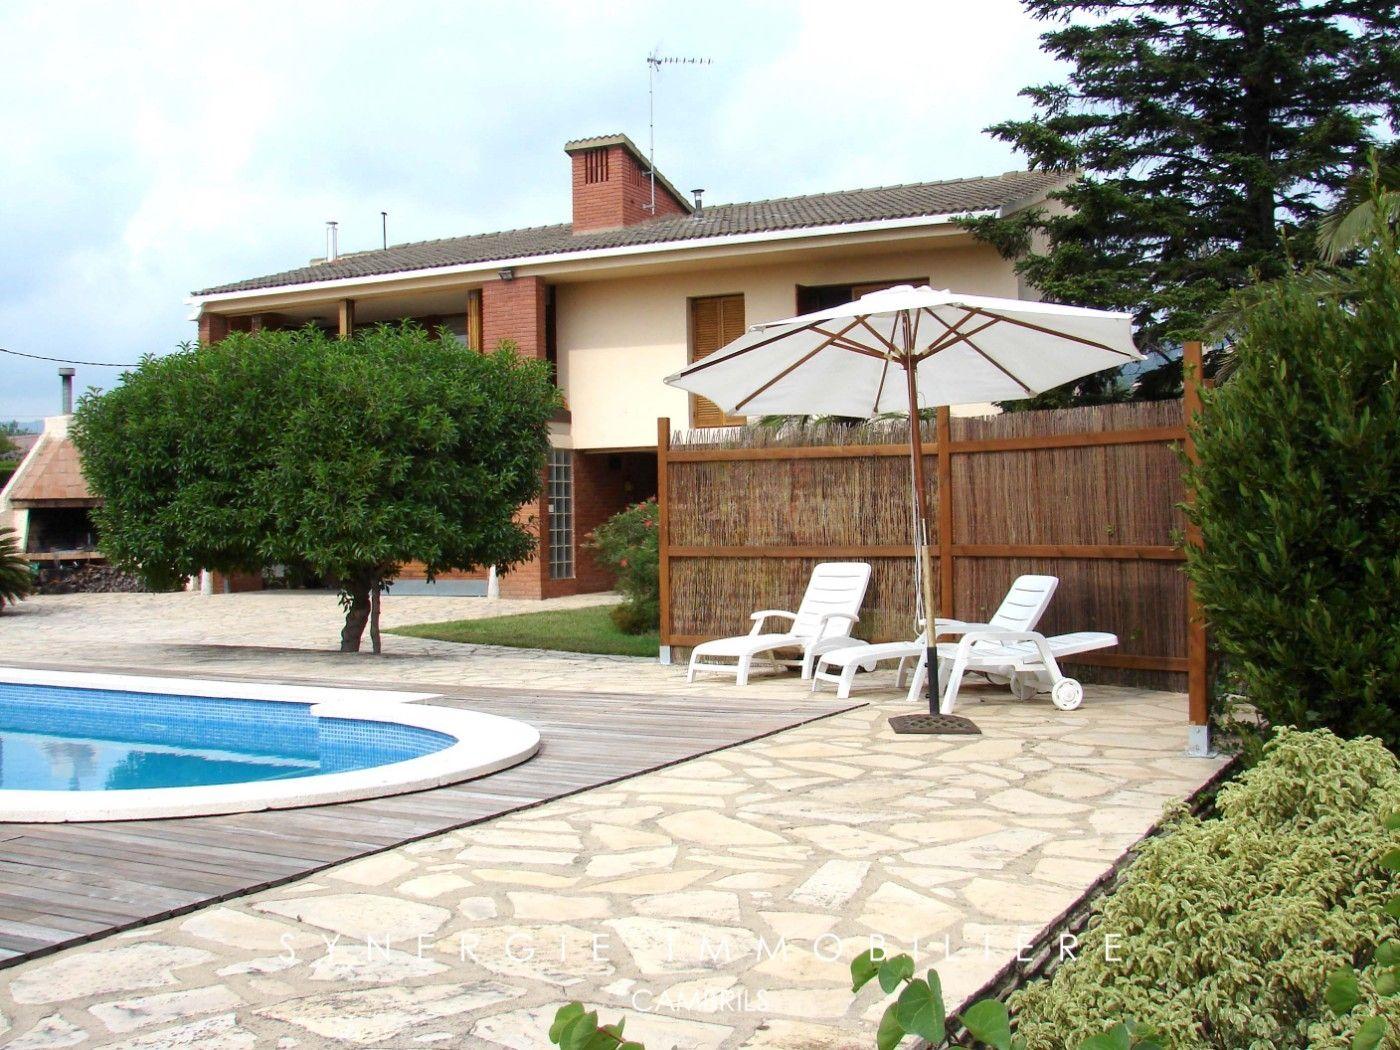 House  Carrer pou (del). Individual con piscina